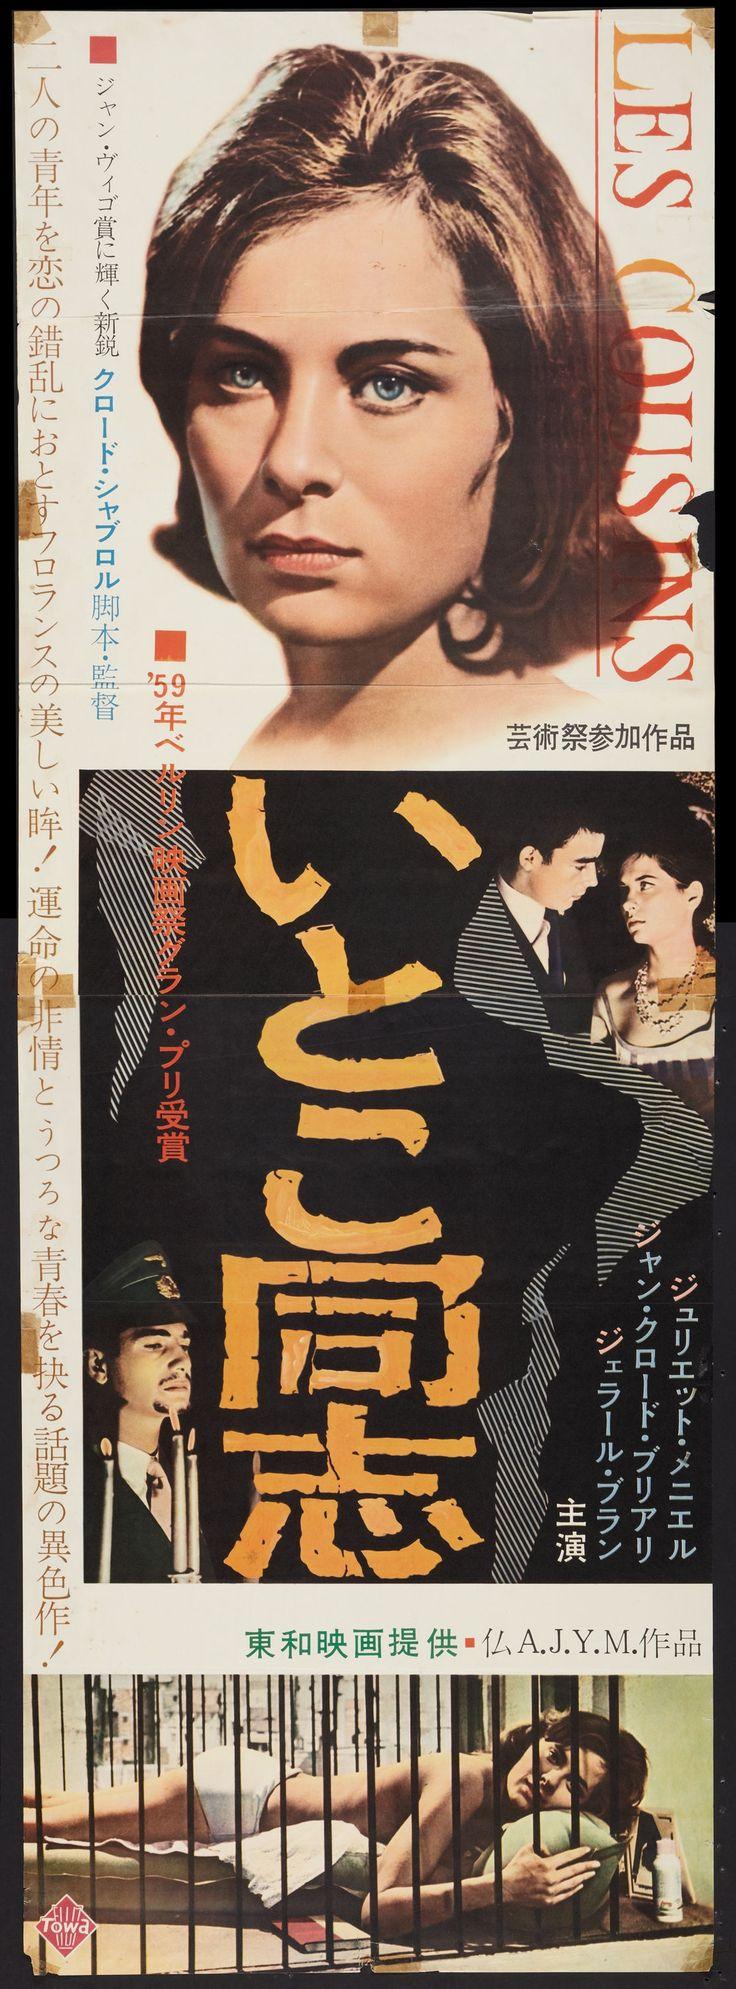 Les Cousins (Claude Chabrol, 1959) Japanese 2 panel design